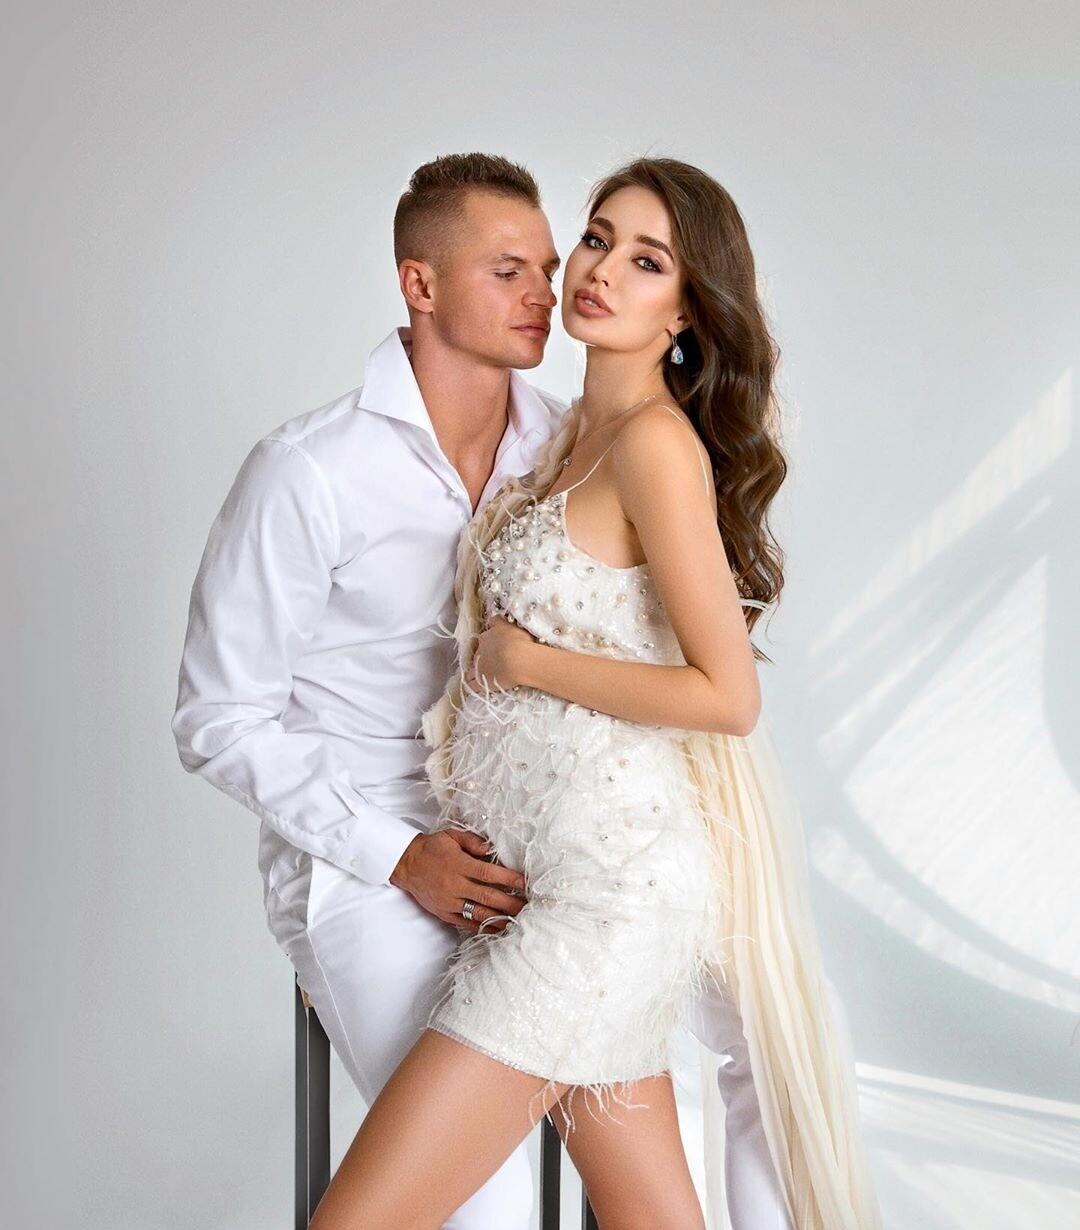 Дмитрий Тарасов признался Костенко в любви (и унизил Бузову)